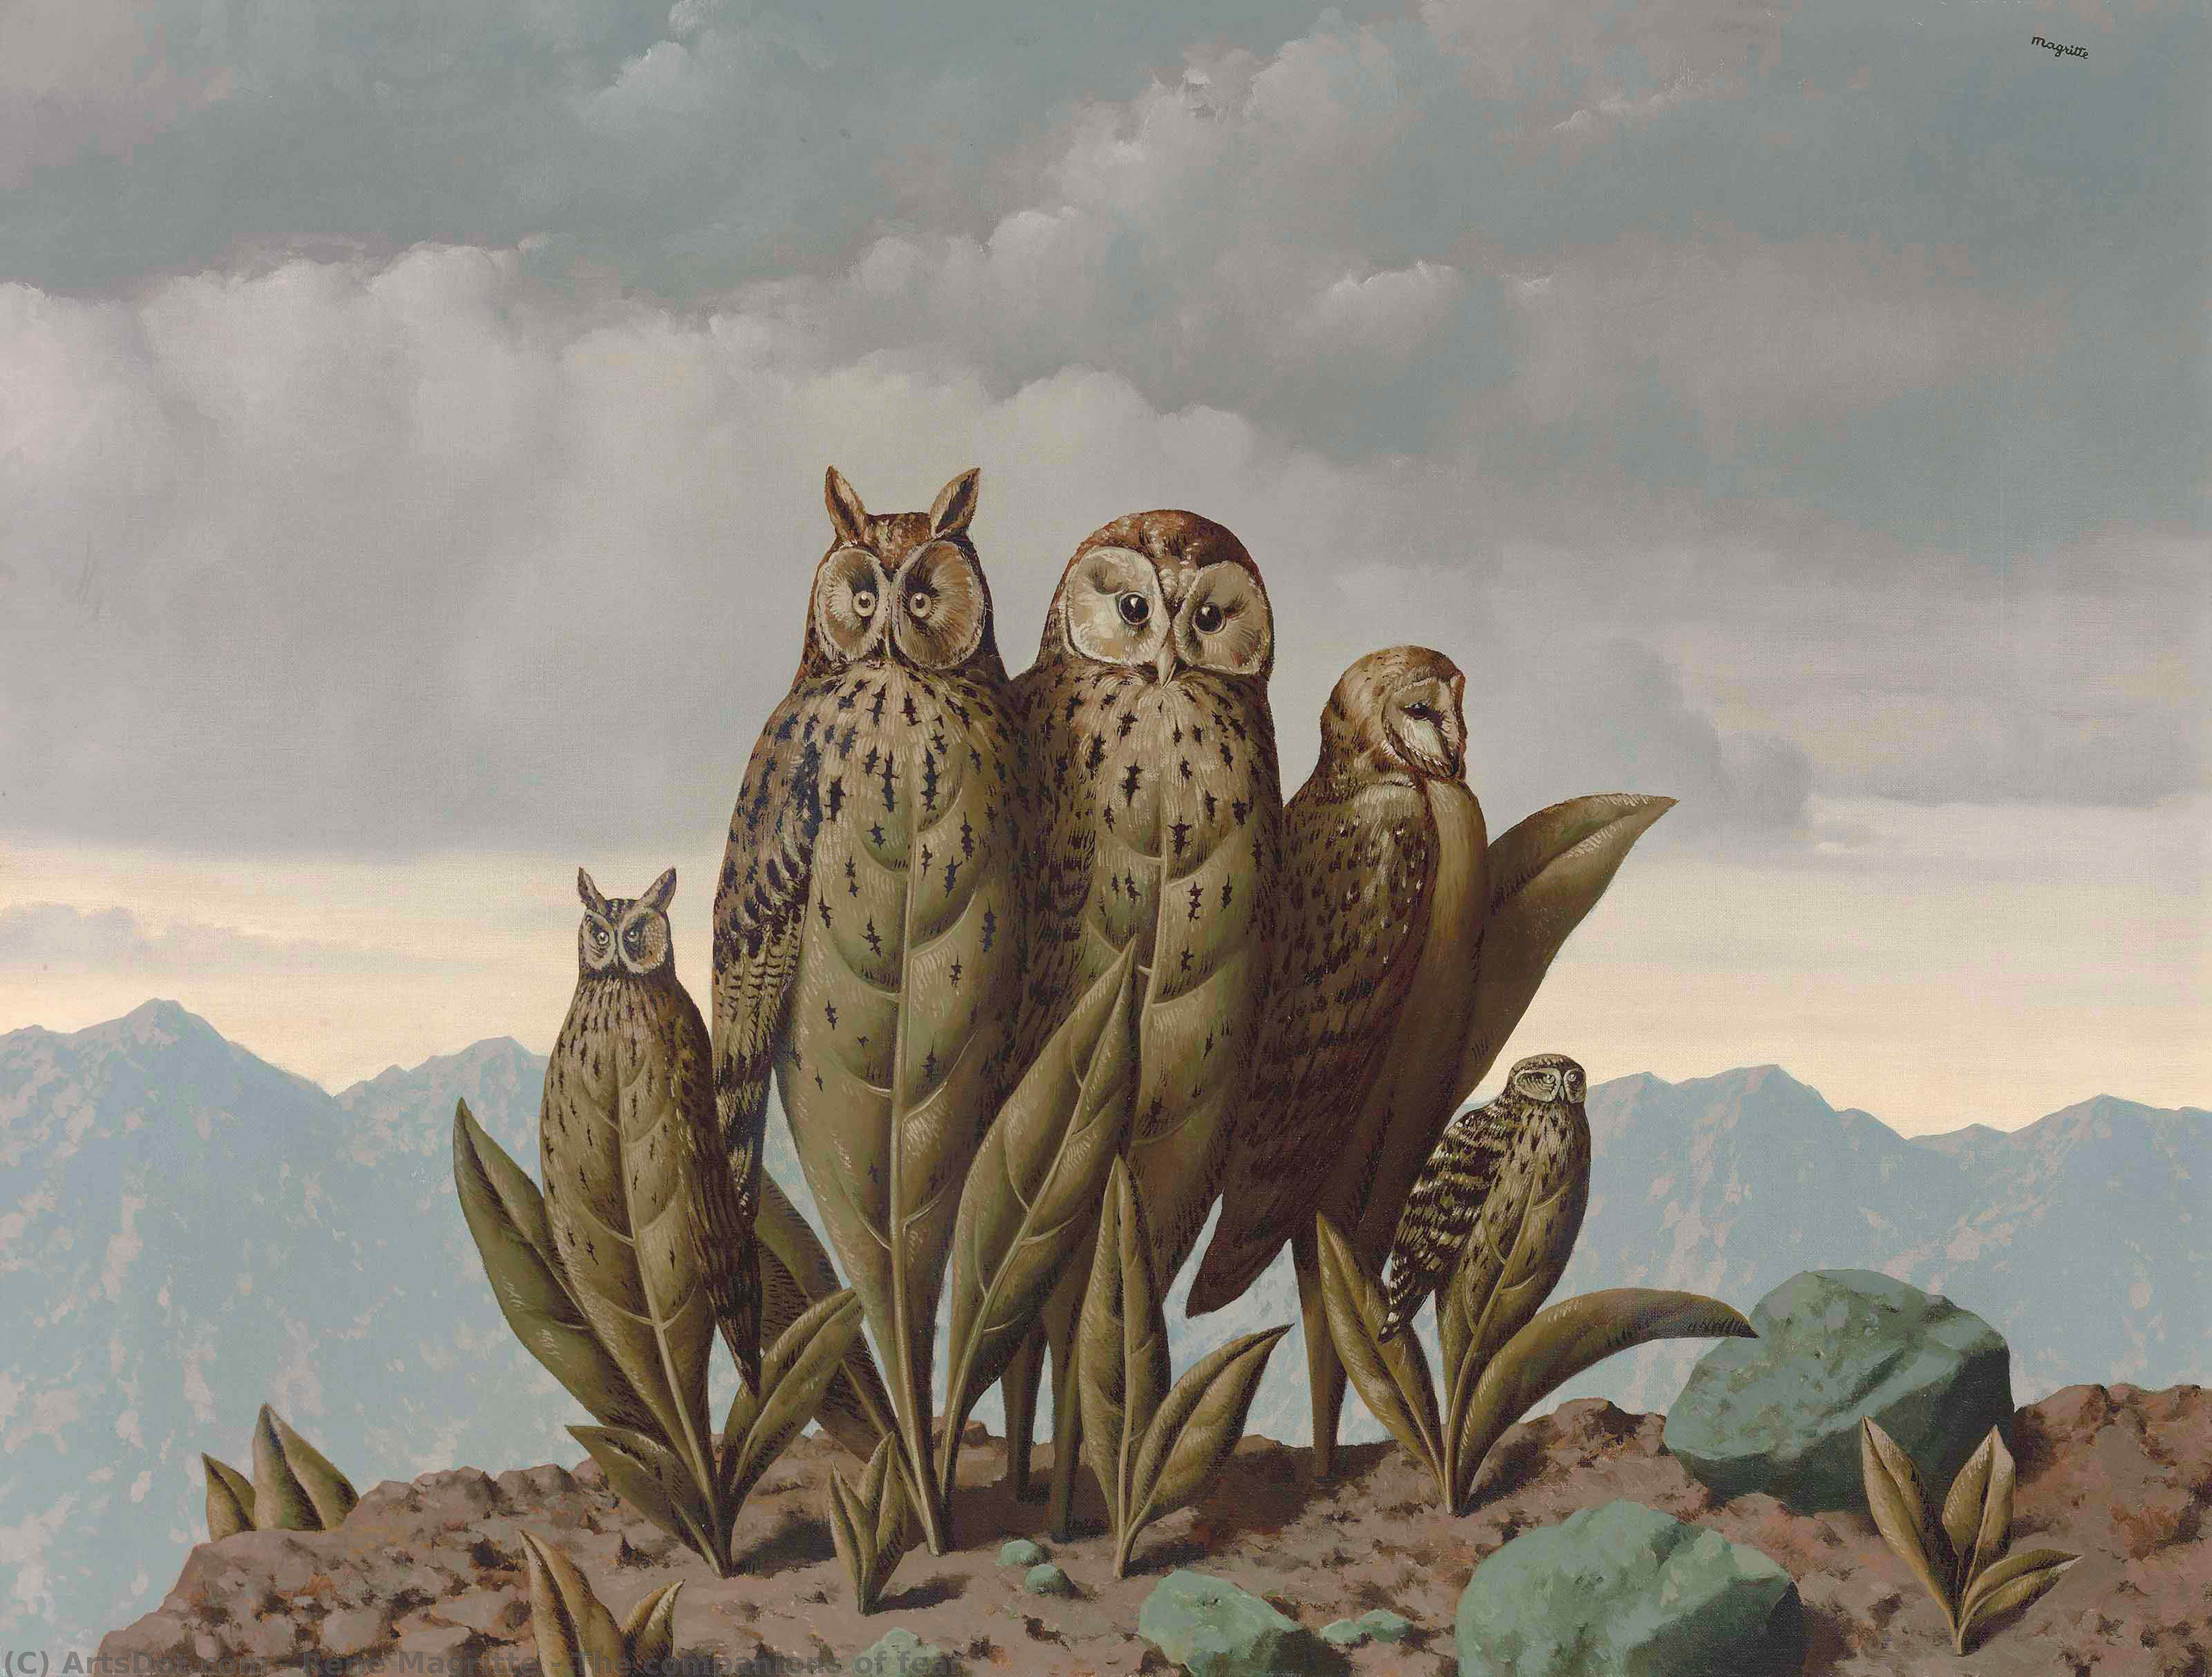 Wikioo.org - Encyklopedia Sztuk Pięknych - Malarstwo, Grafika Rene Magritte - The companions of fear